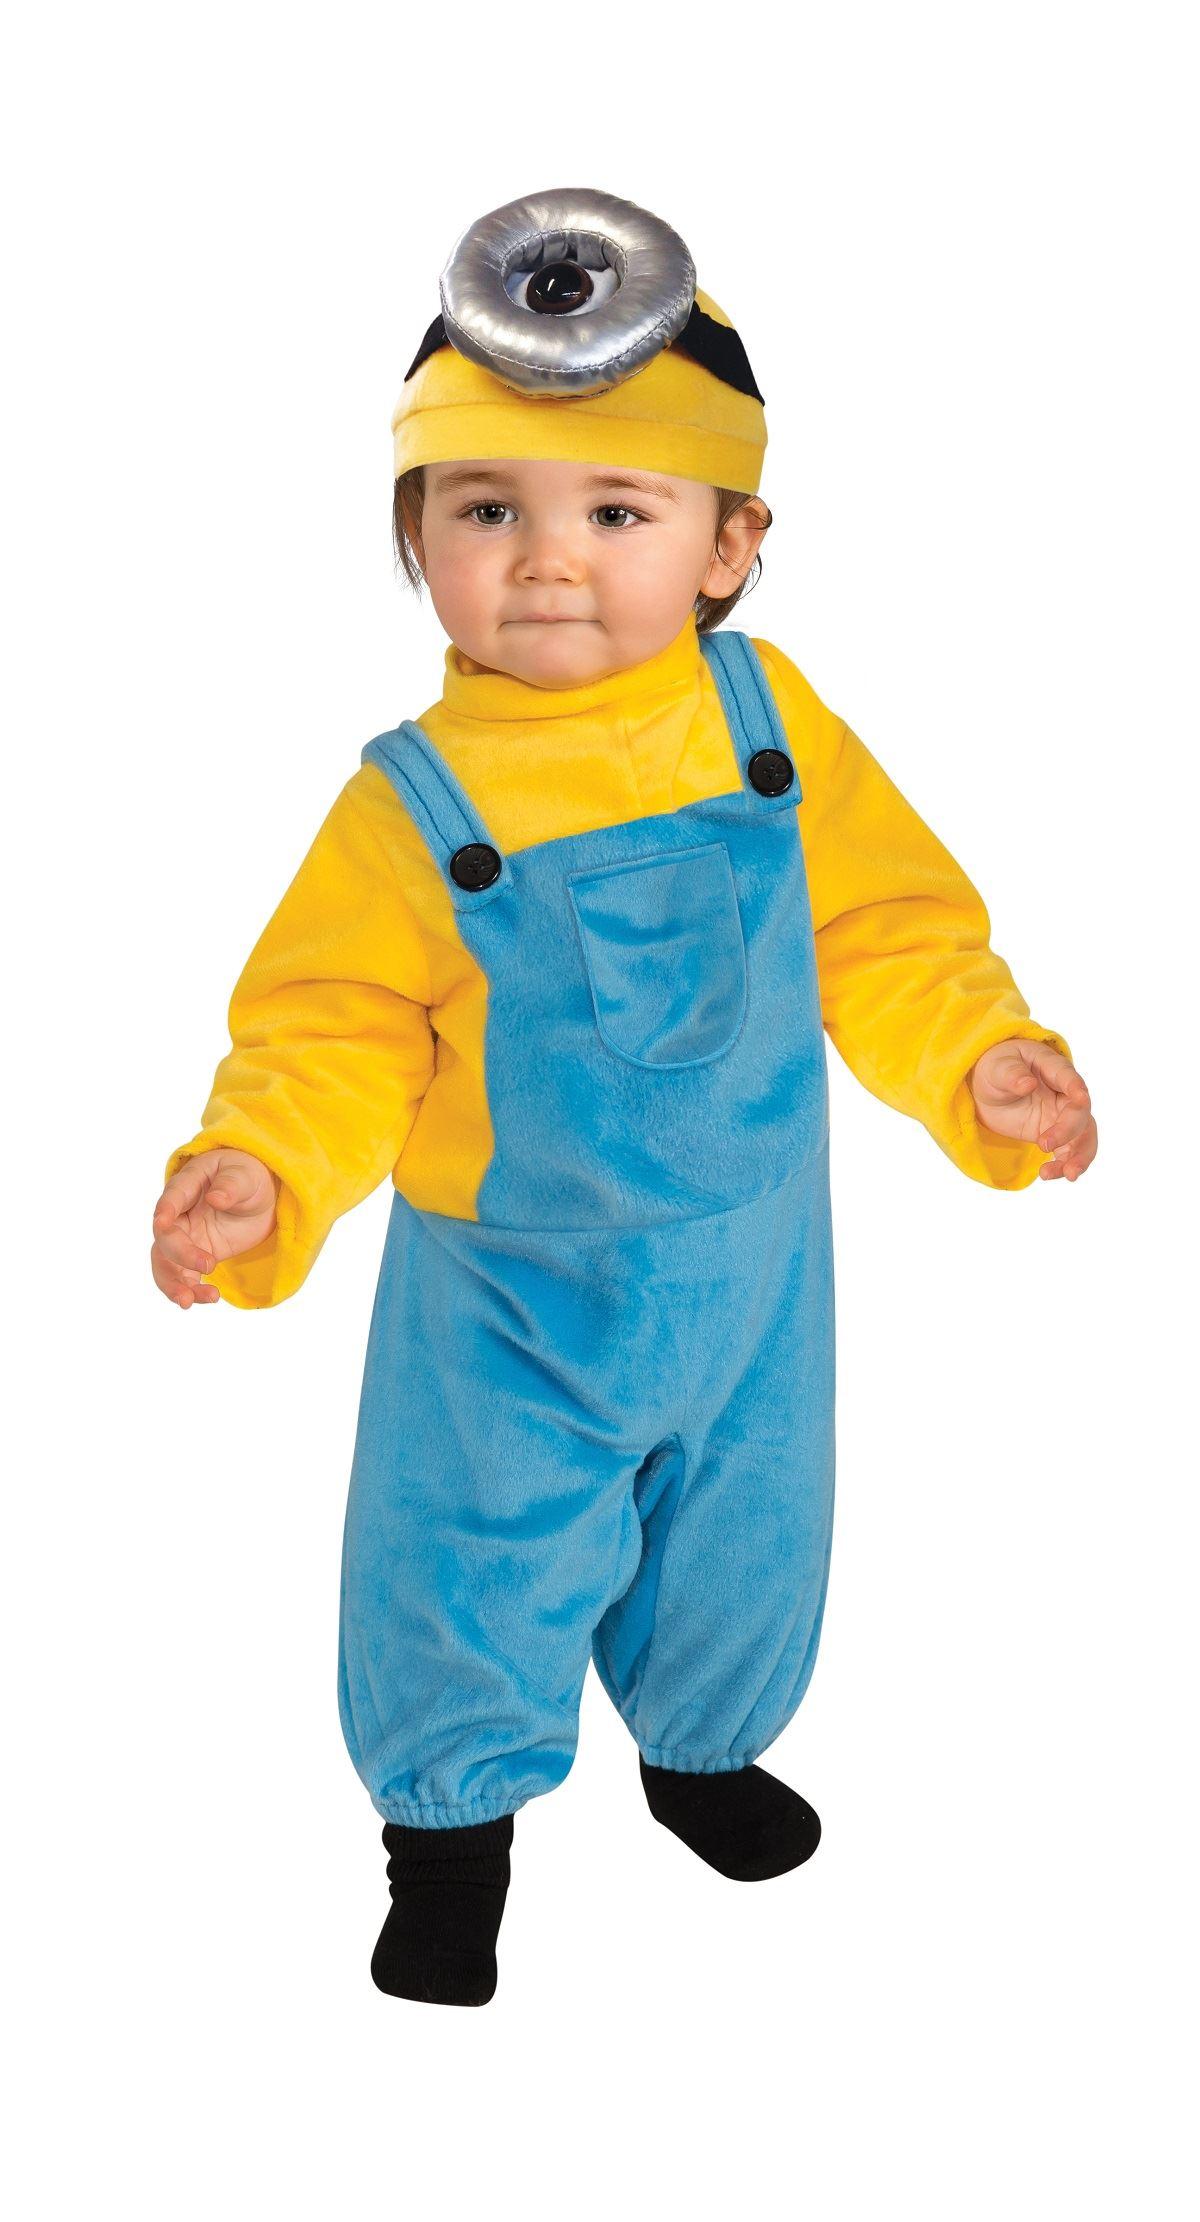 Kids Minion Stuart Toddler Costume | $22.99 | The Costume Land